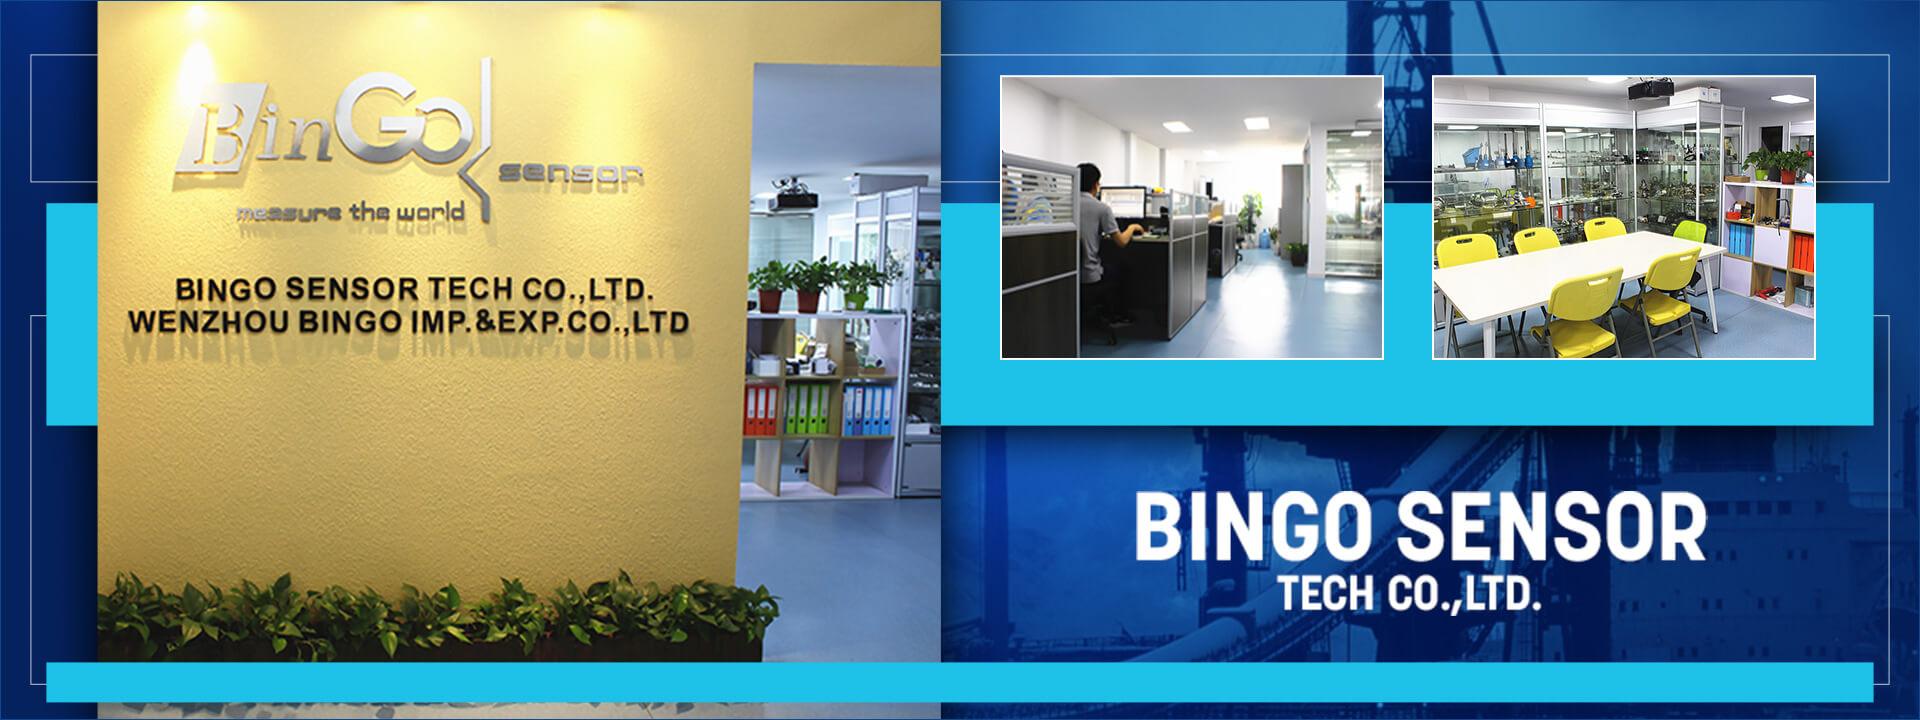 Banner di bingo 02